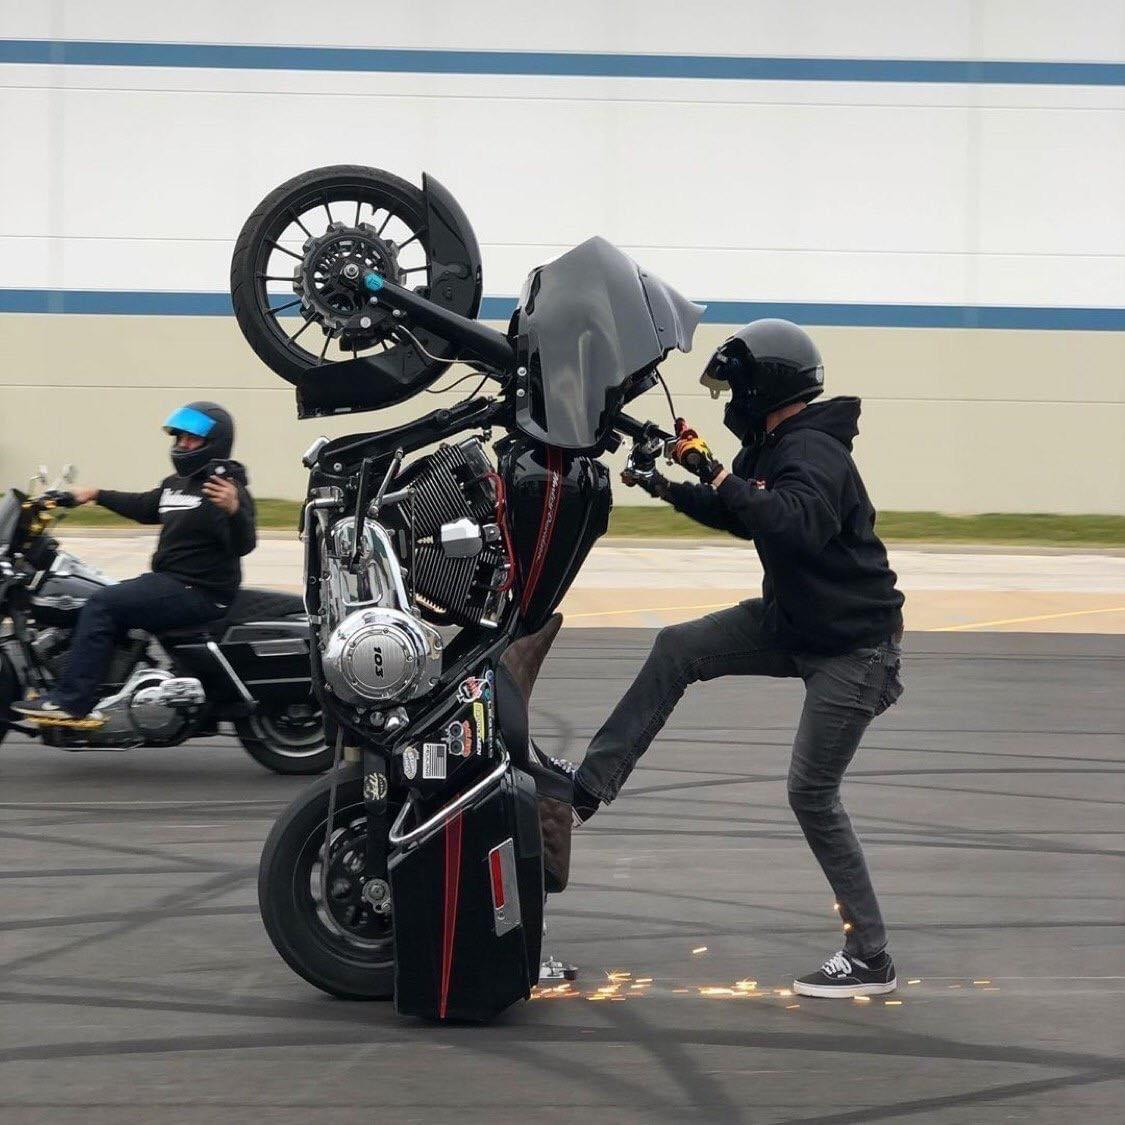 Публикация с тегами: HD, Интересное, Мотоциклы и велосипеды, Мужчина